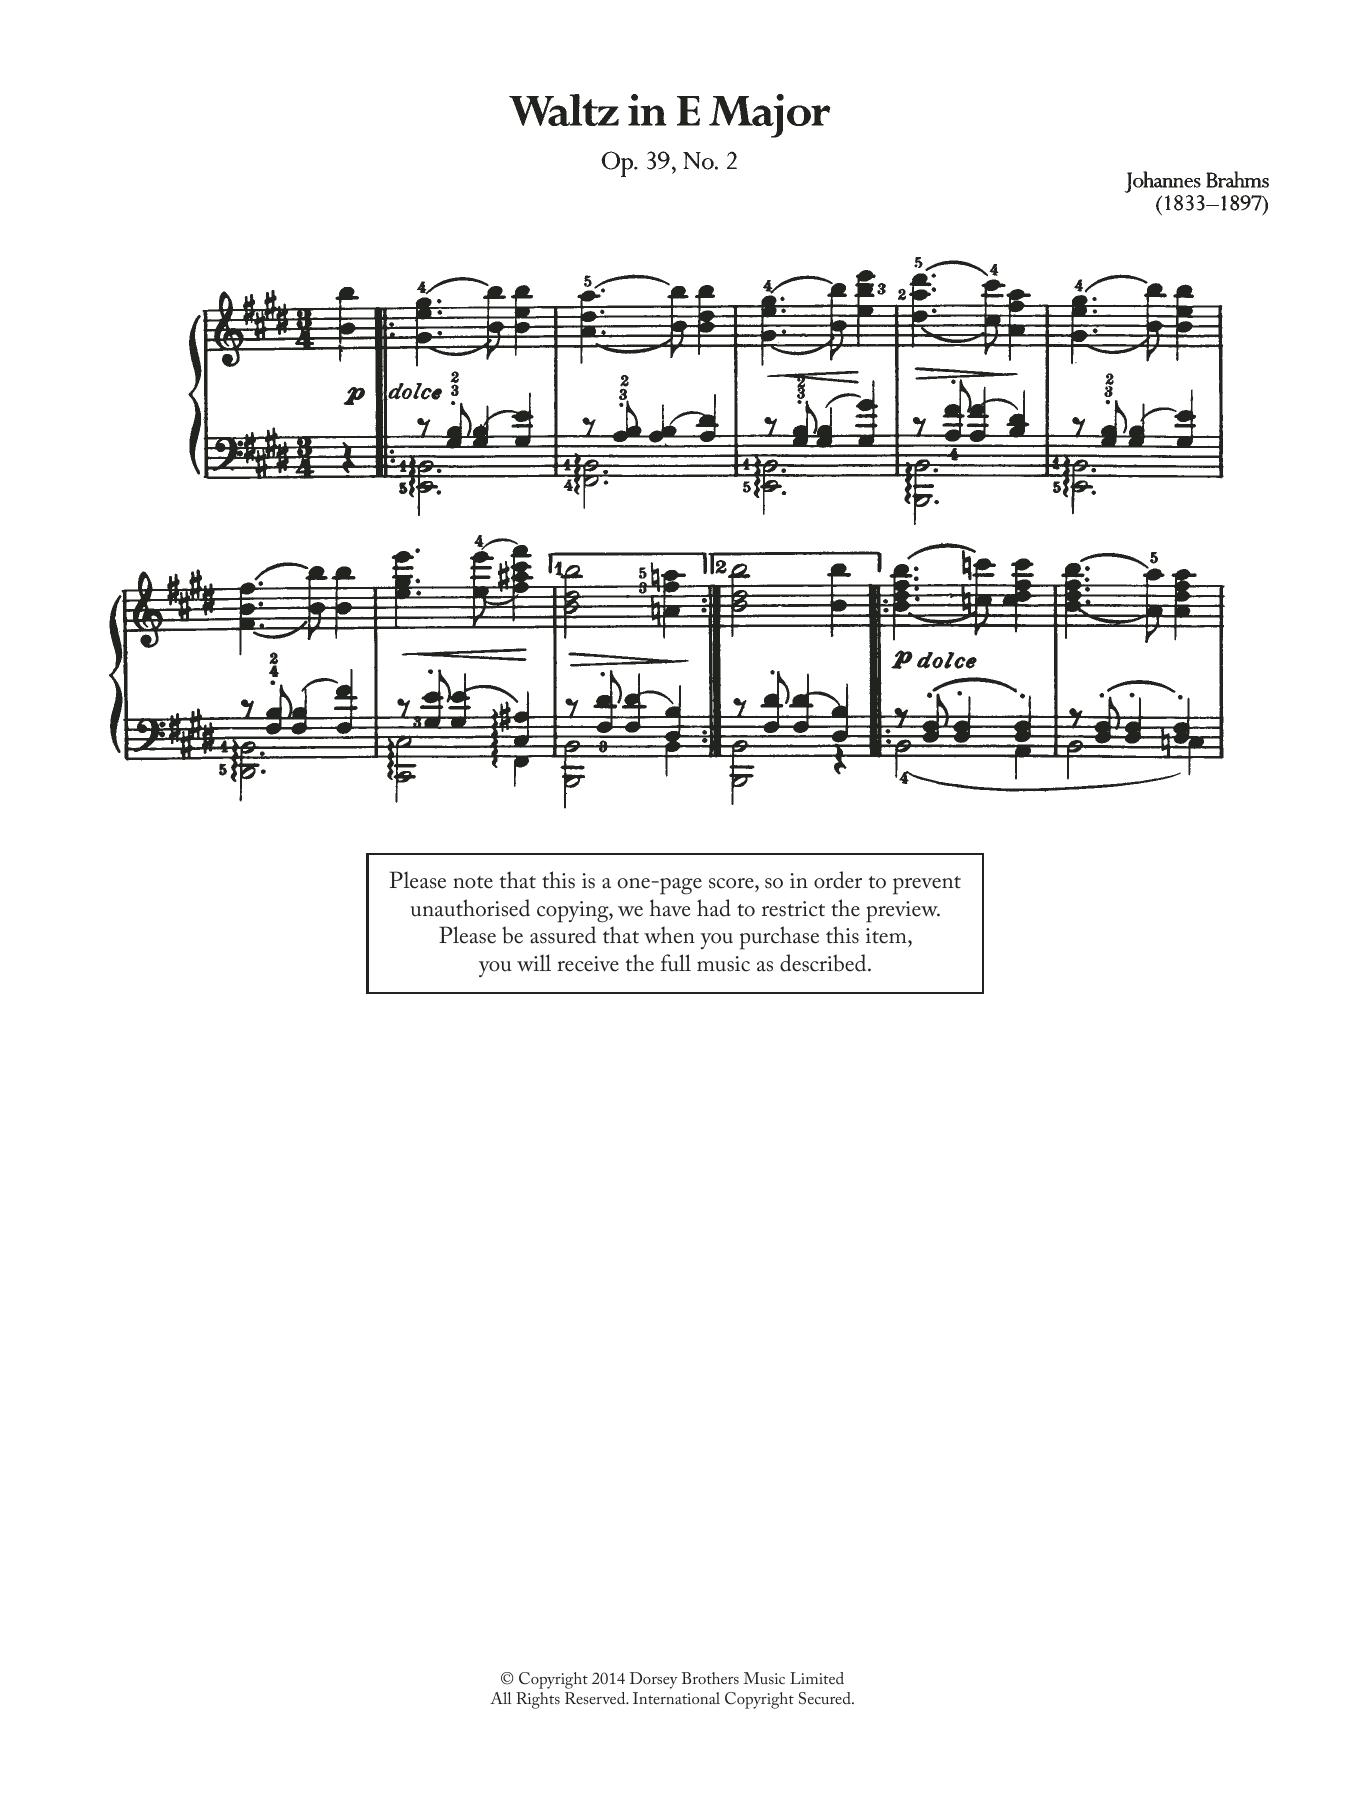 Waltz In E Major, Op.39 No.2 Sheet Music